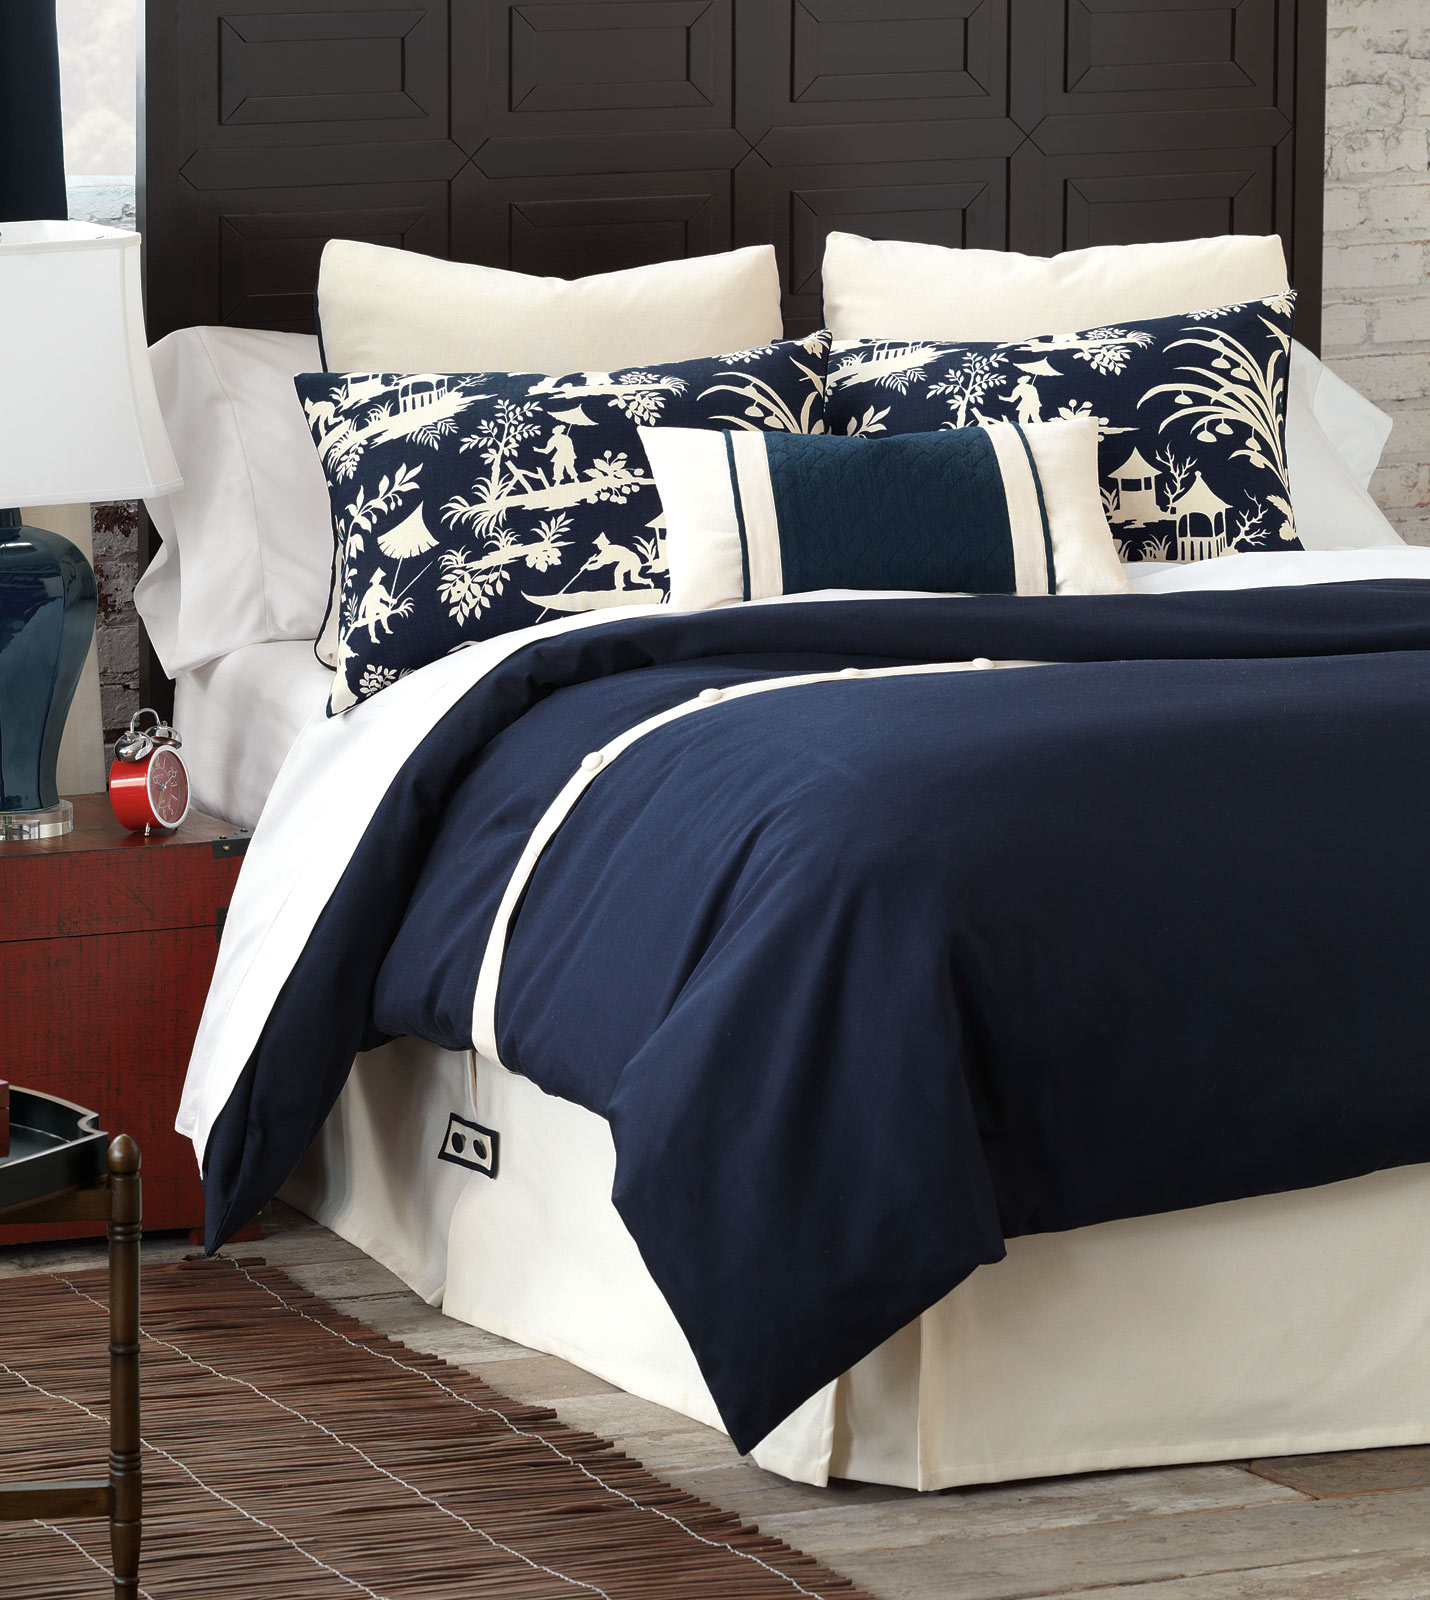 Schooner navy duvet cover and comforter duvet cover decorative fabrics